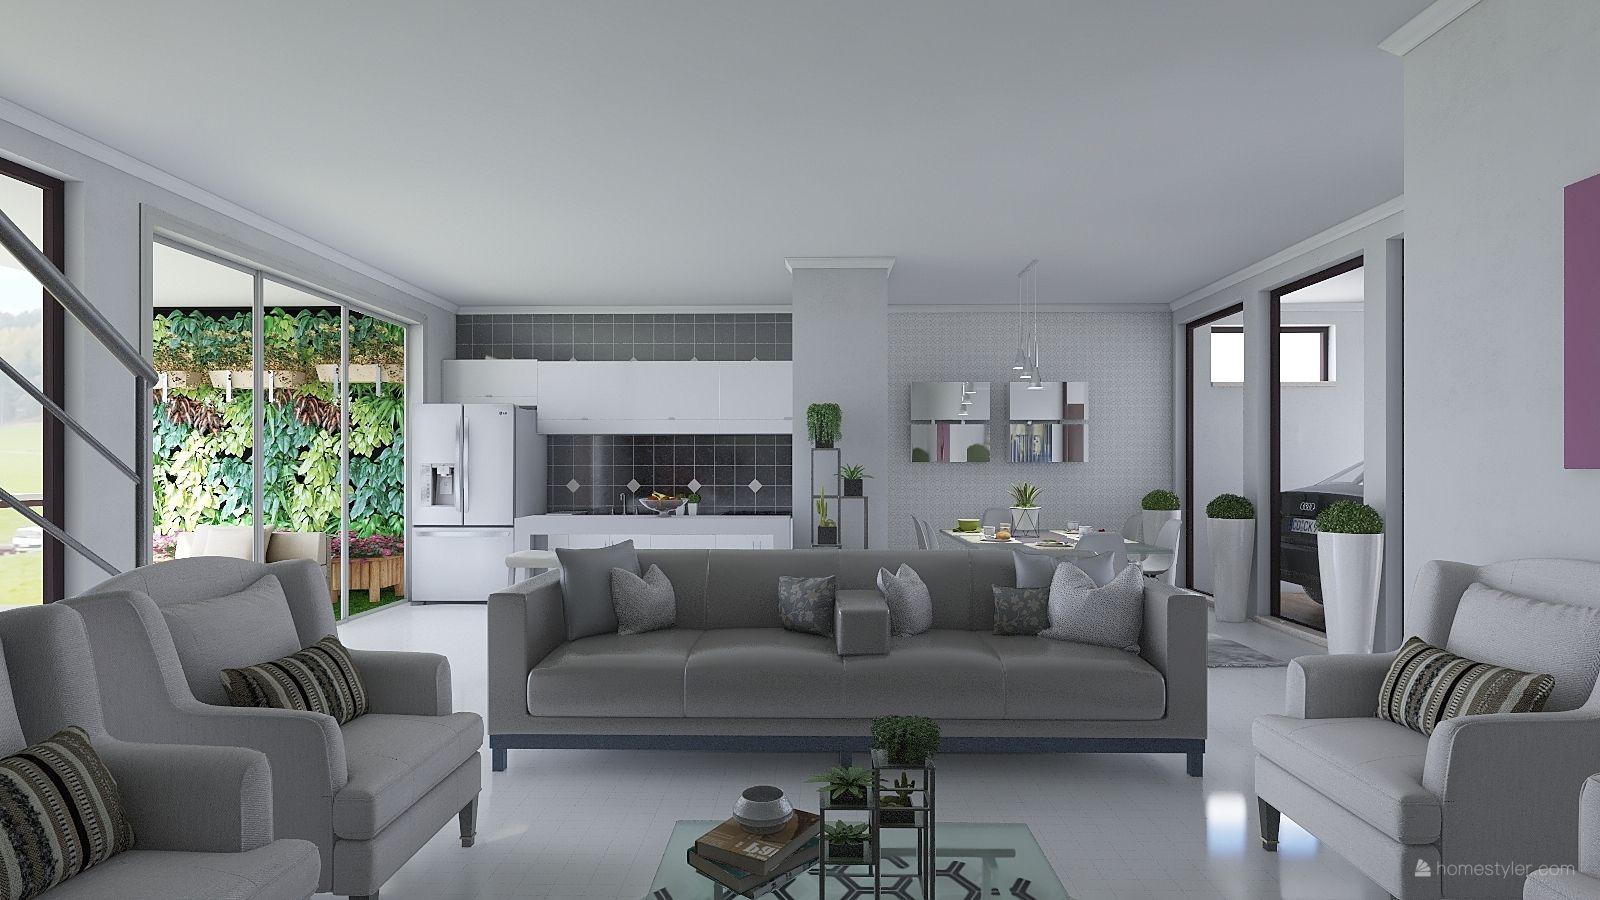 Living Room Design By Caty 3d Home Design Software Home Design